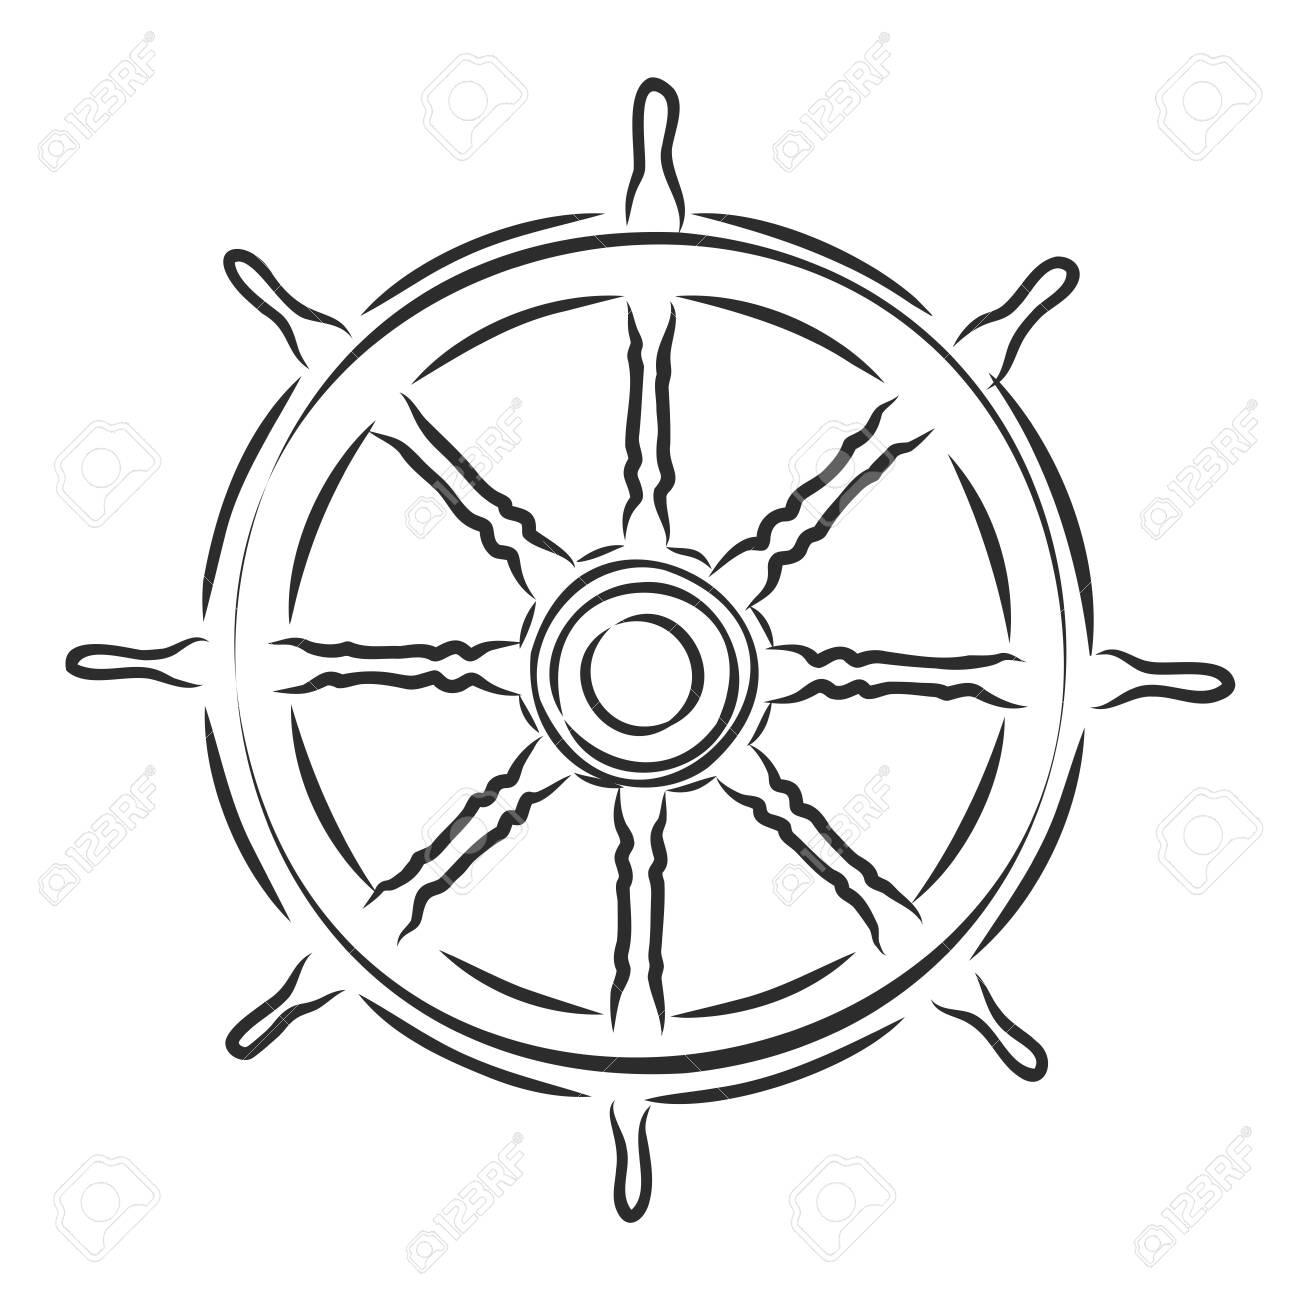 sea wooden helm yacht, vector sketch illustration - 139574744